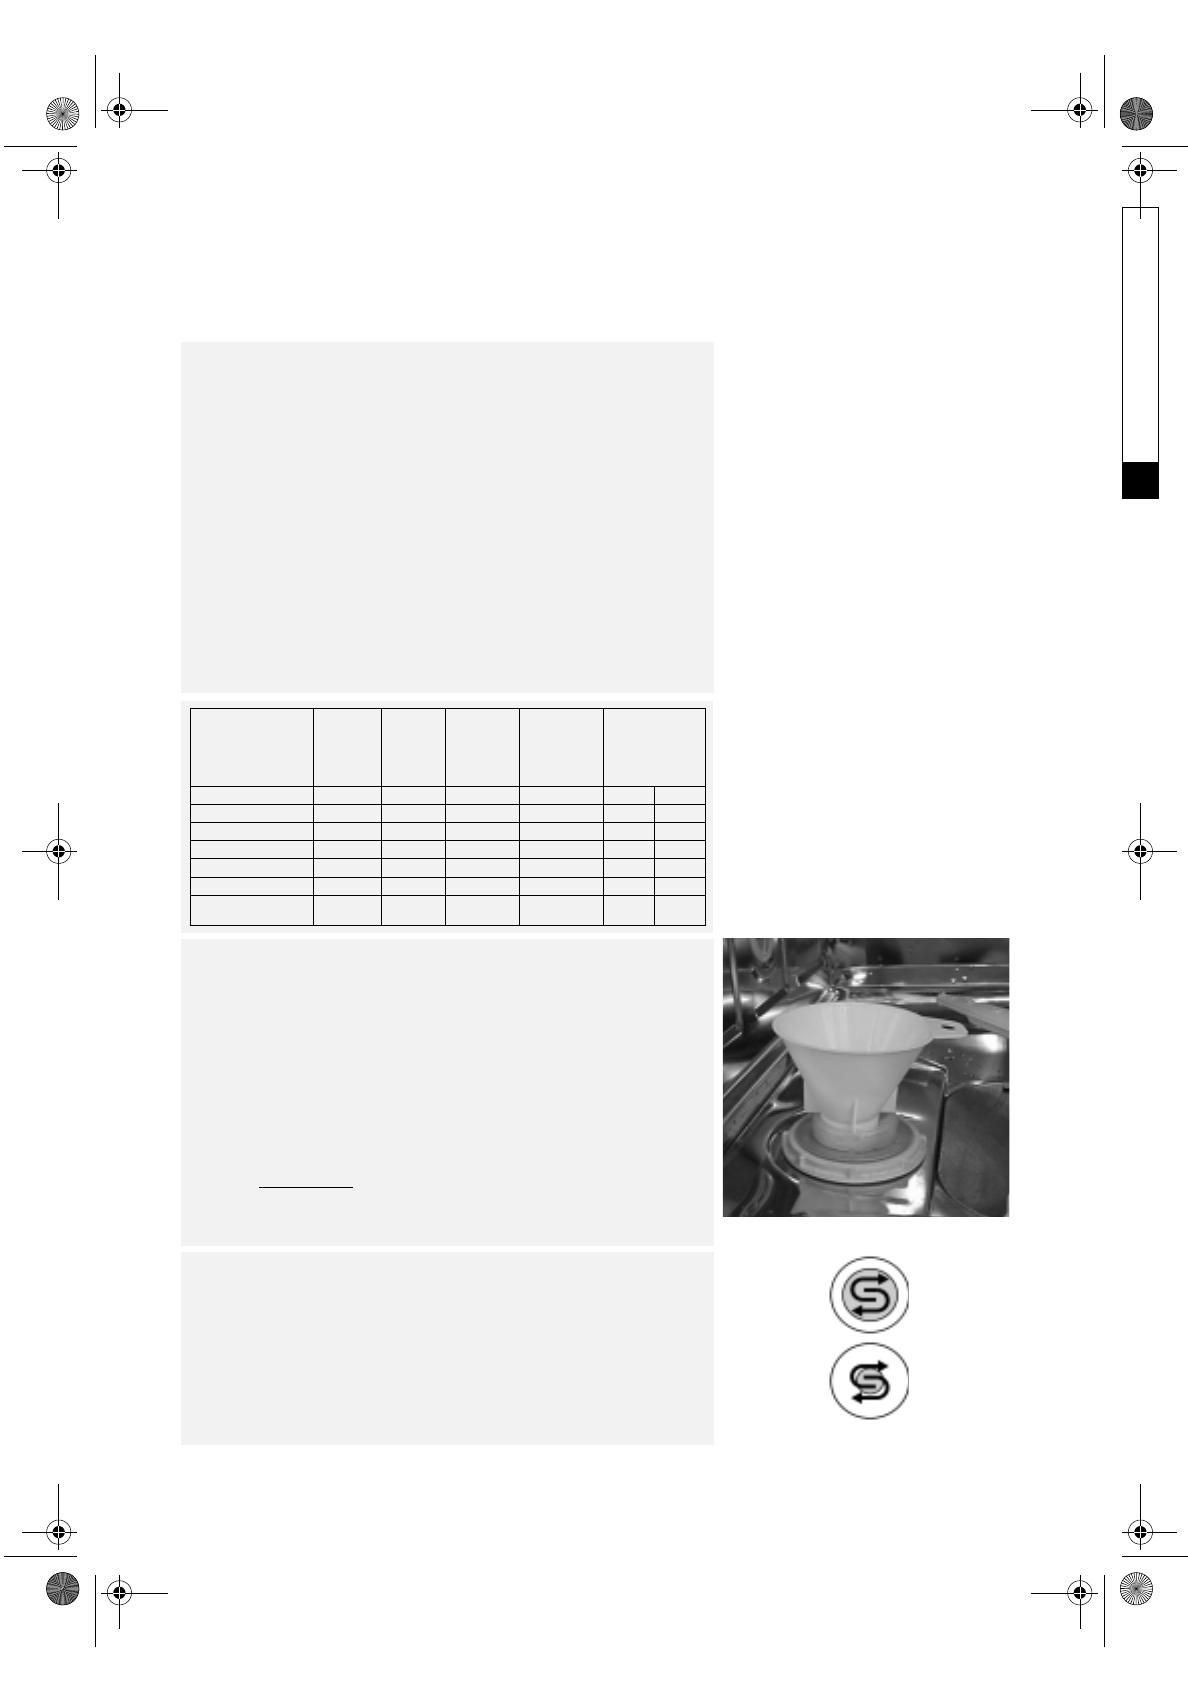 handleiding whirlpool dwh b00 w pagina 4 van 8 nederlands. Black Bedroom Furniture Sets. Home Design Ideas